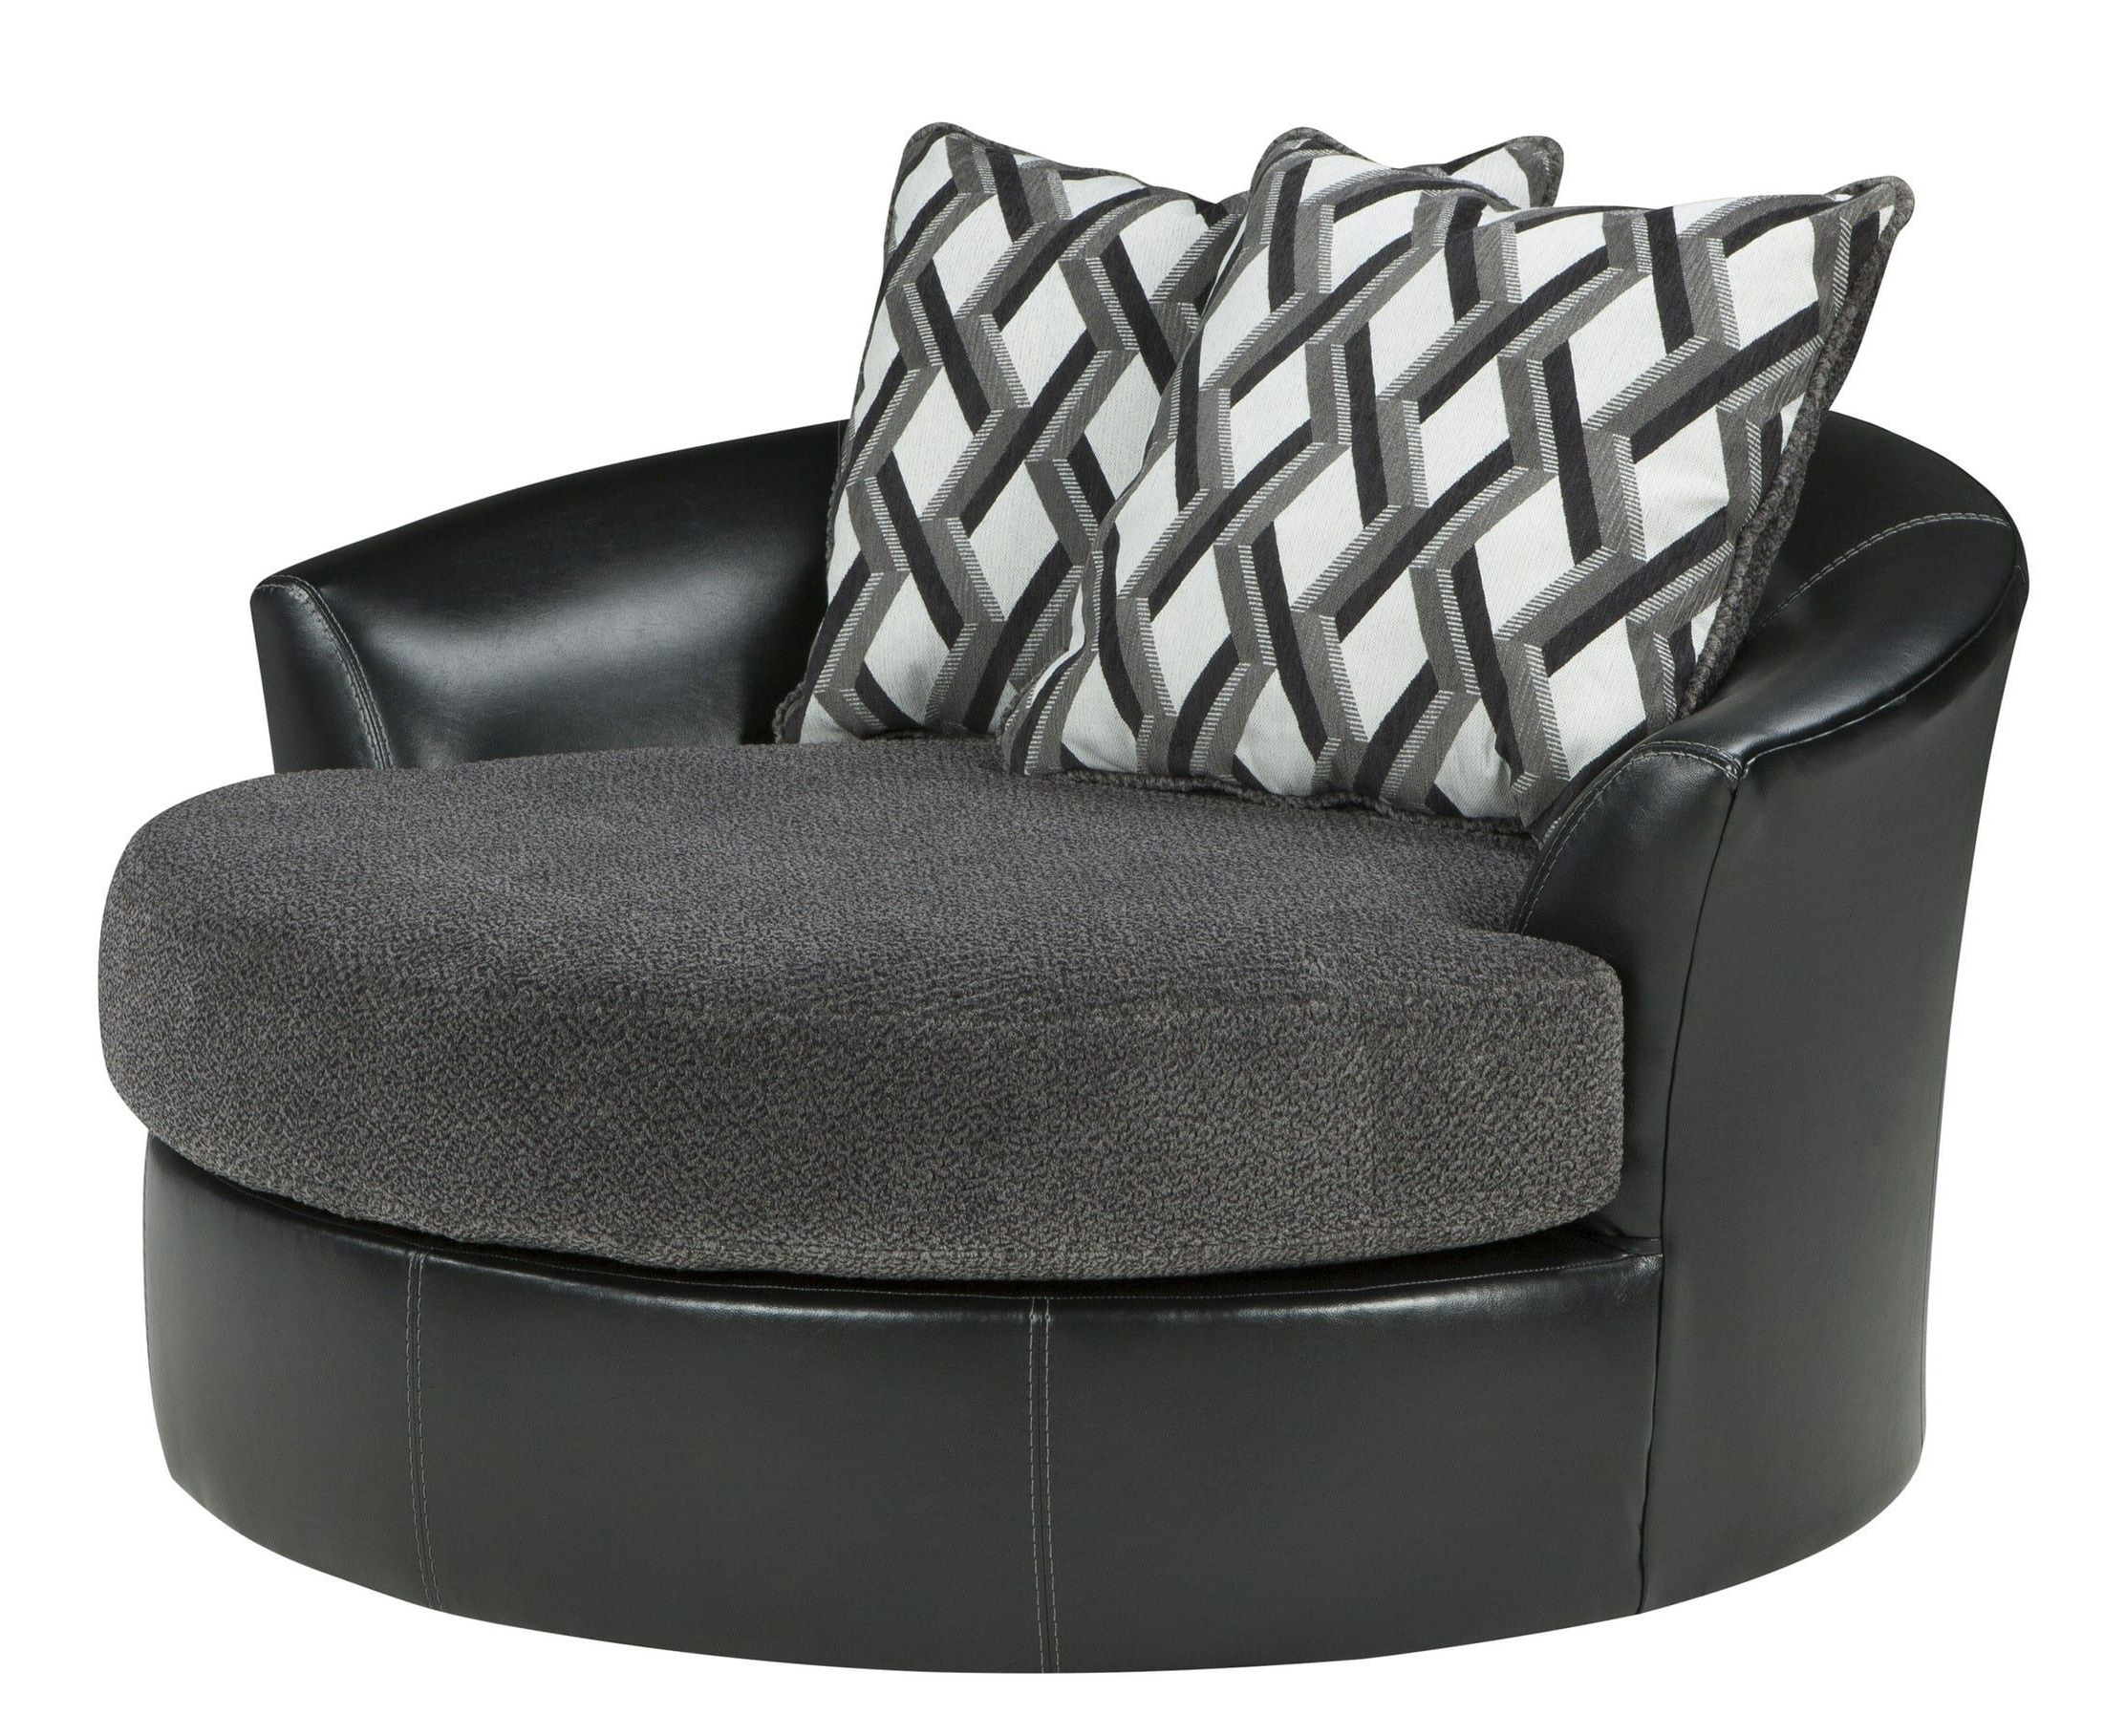 Mesa Foam Oversized Sofa Chairs Regarding Current Kumasi Smoke Oversized Swivel Accent Chair (Gallery 15 of 20)